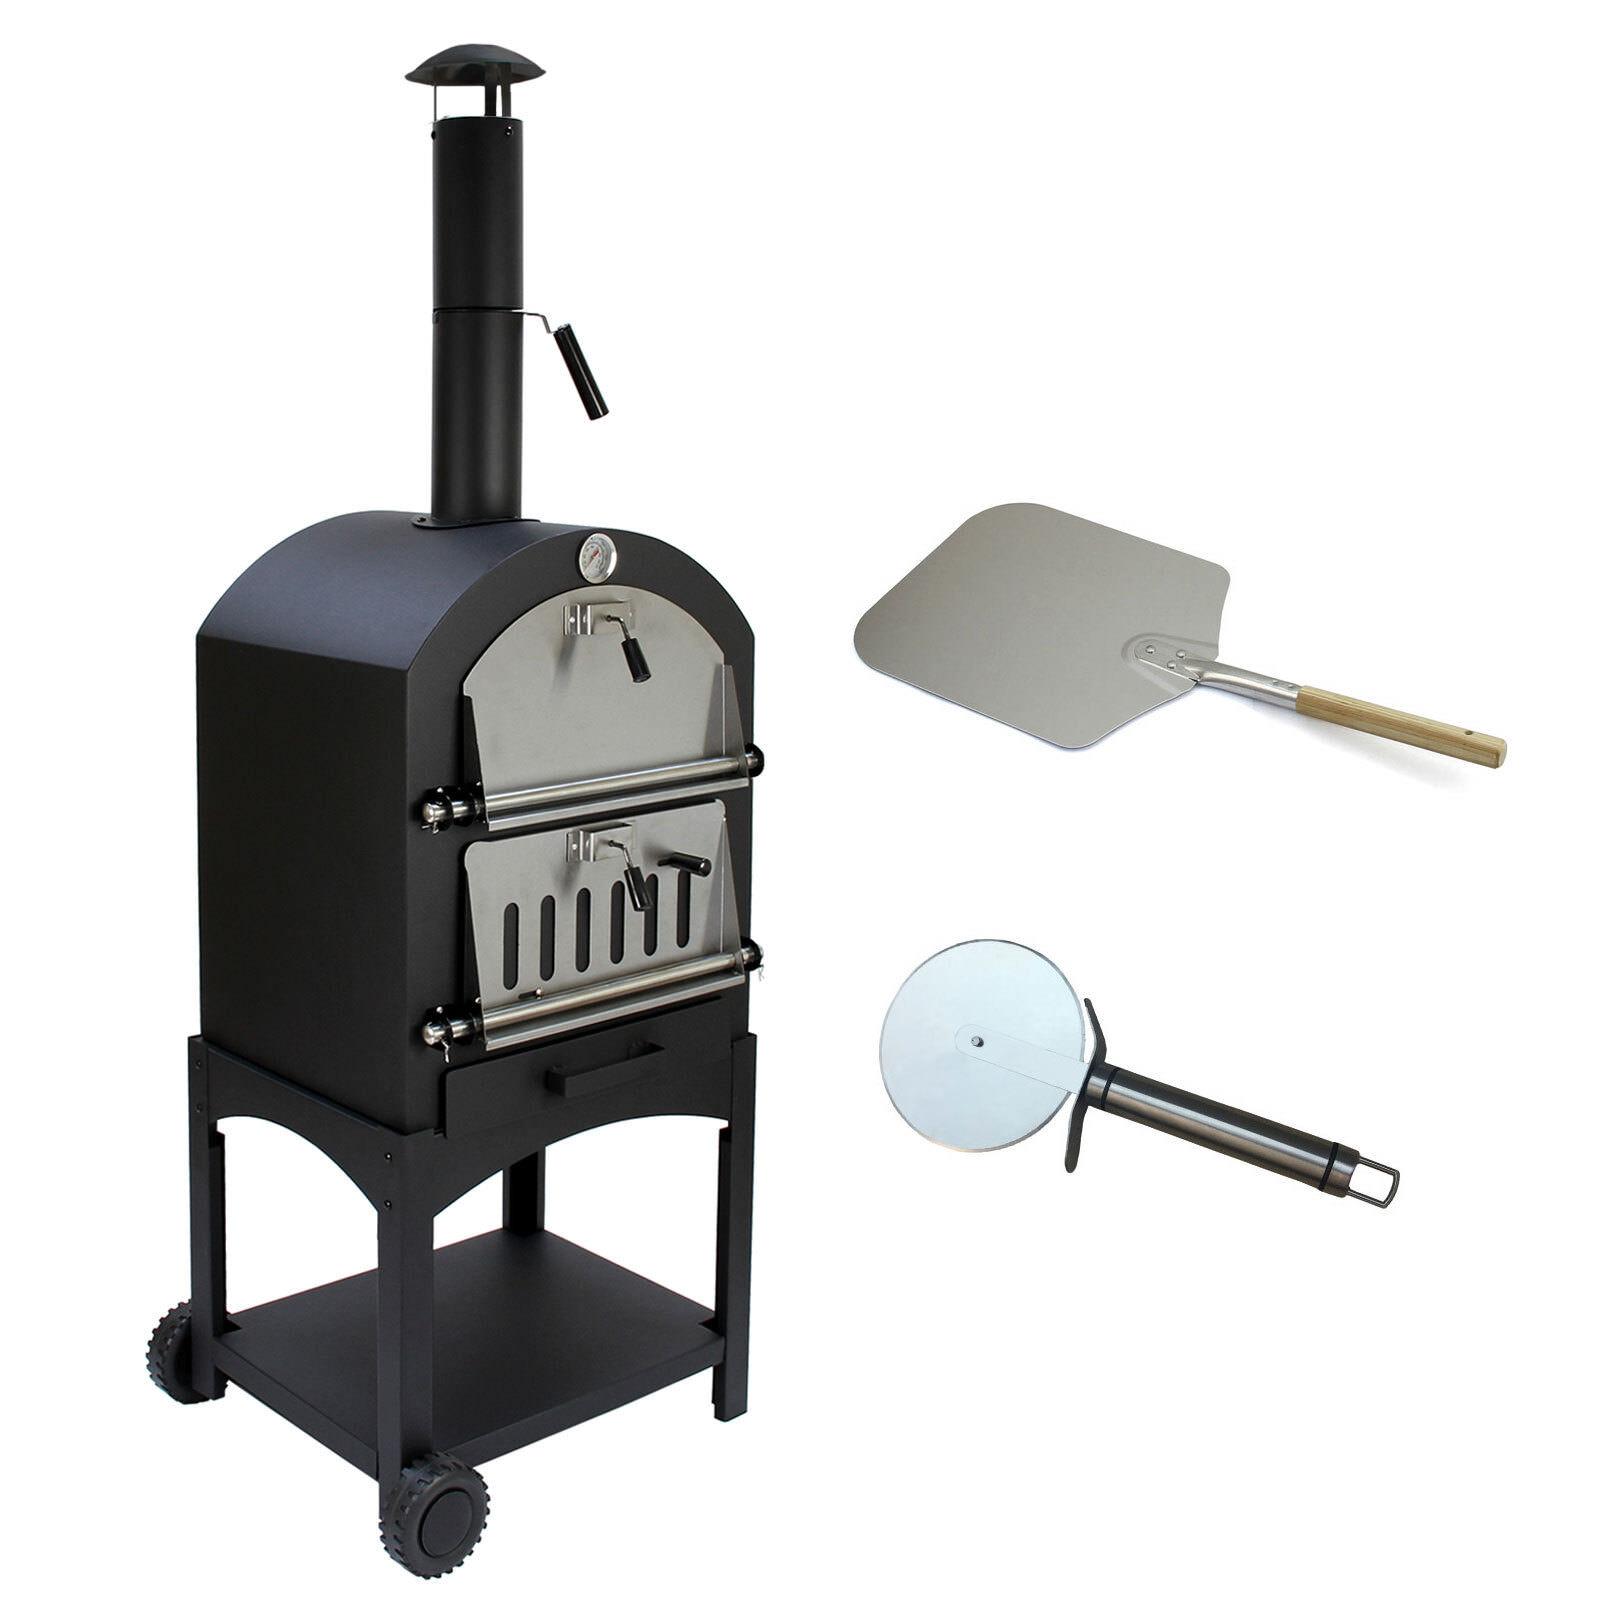 Outdoor Pizza Oven Garden Chimney Charcoal Bbq Smoker Bread Oven Ebay